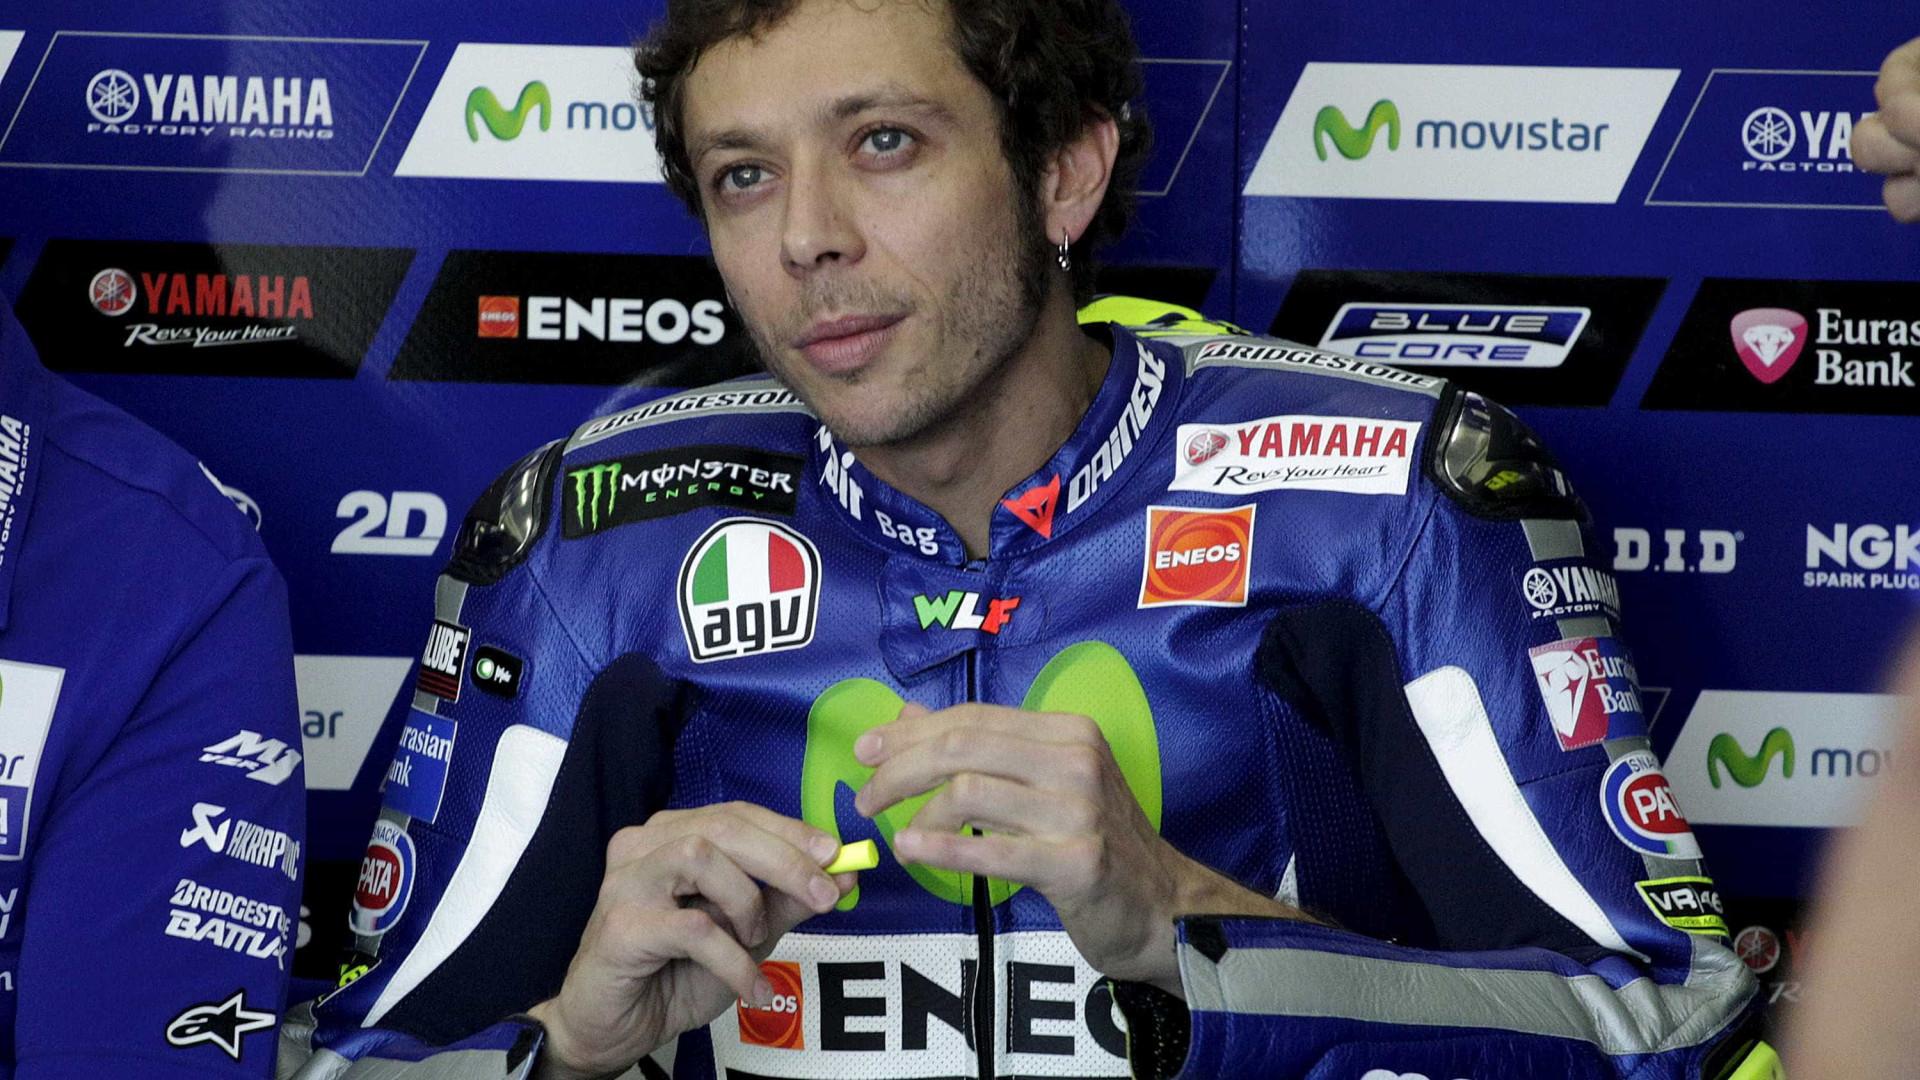 Valentino Rossi confessa ter medo de se aposentar